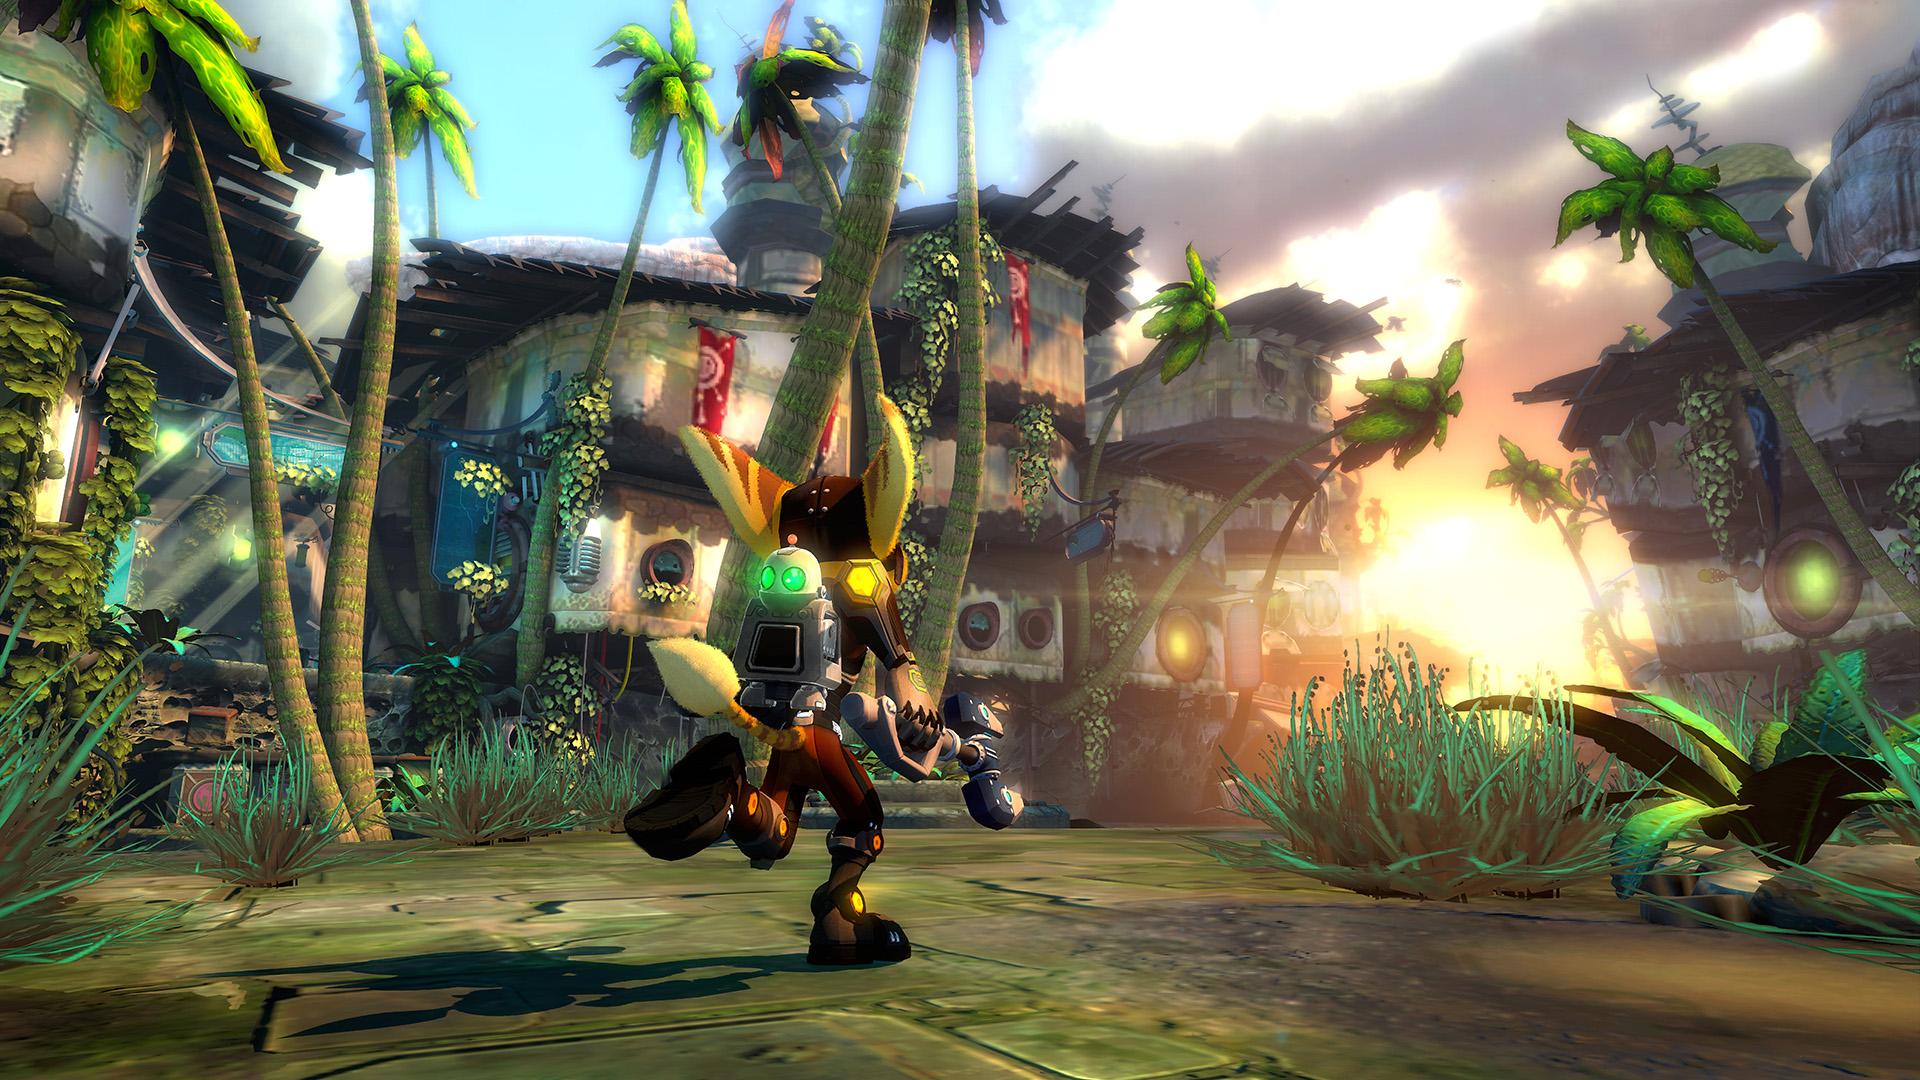 Ratchet & Clank PS3 lance flamme